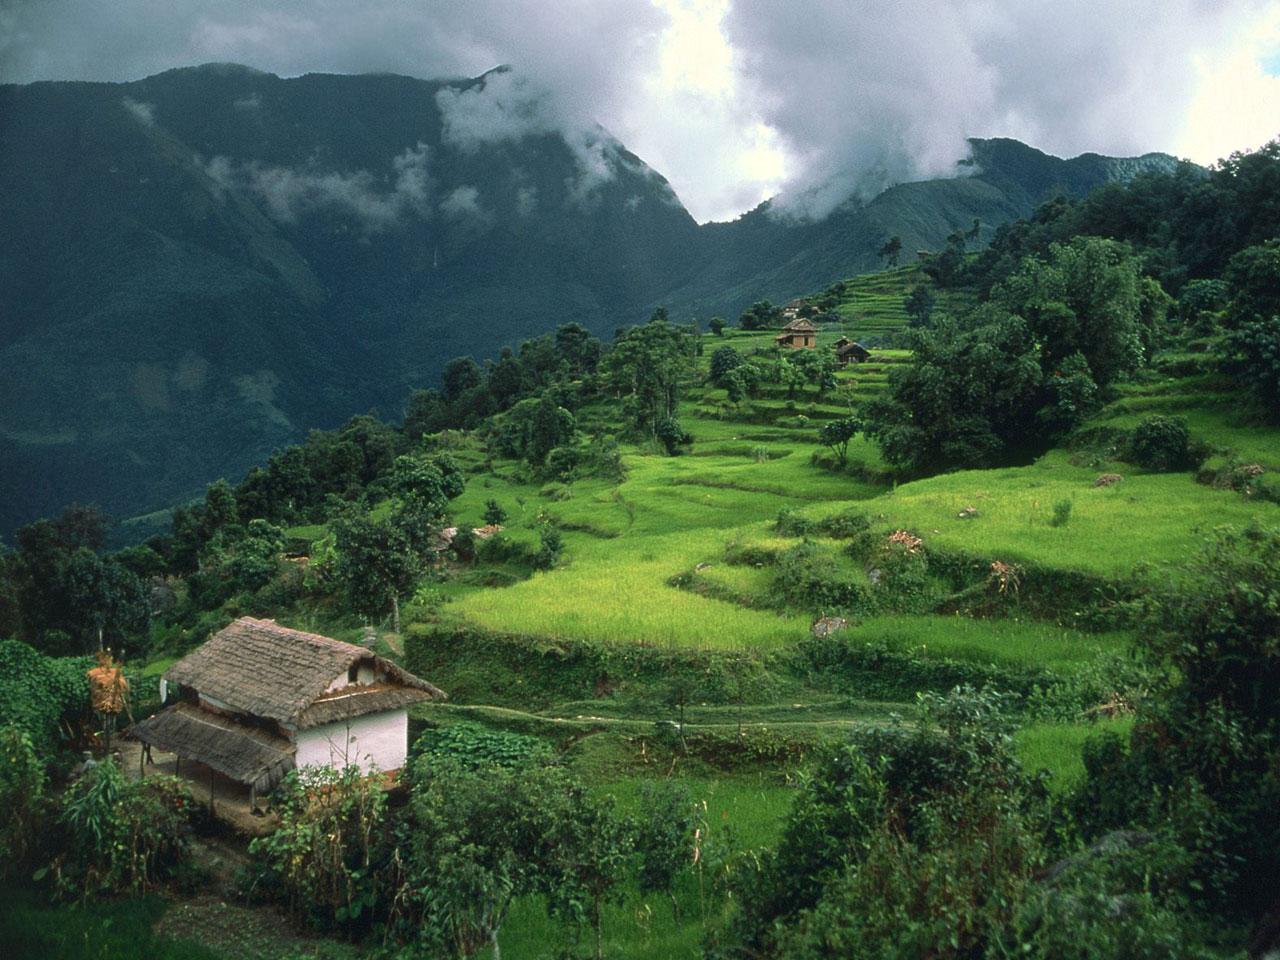 http://4.bp.blogspot.com/_fd4CLh8AbAg/S8NTd0mPGUI/AAAAAAAAASQ/3_ssmnxTyro/s1600/Arun_River_Region_Nepal.jpg